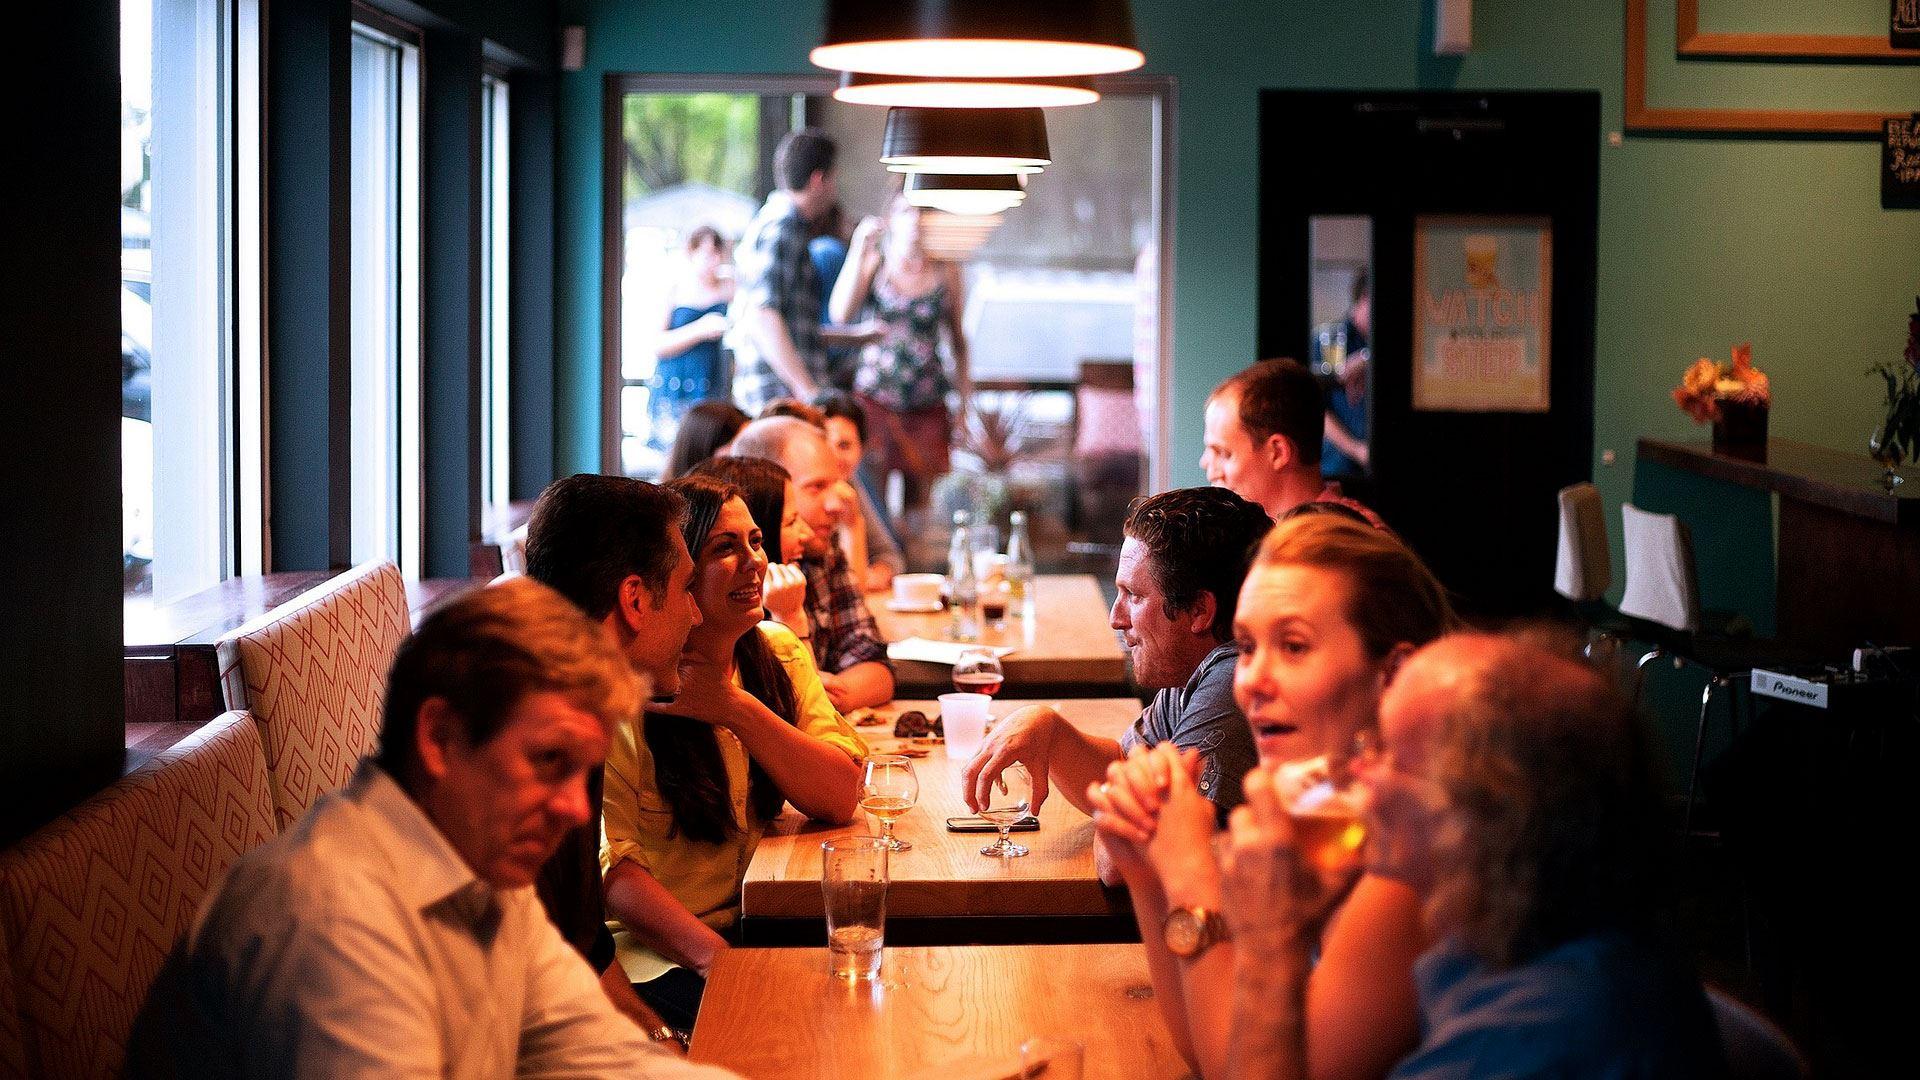 Restaurantele sunt afaceri in care conteaza prima impresie si relatia pe care o creezi cu clientii